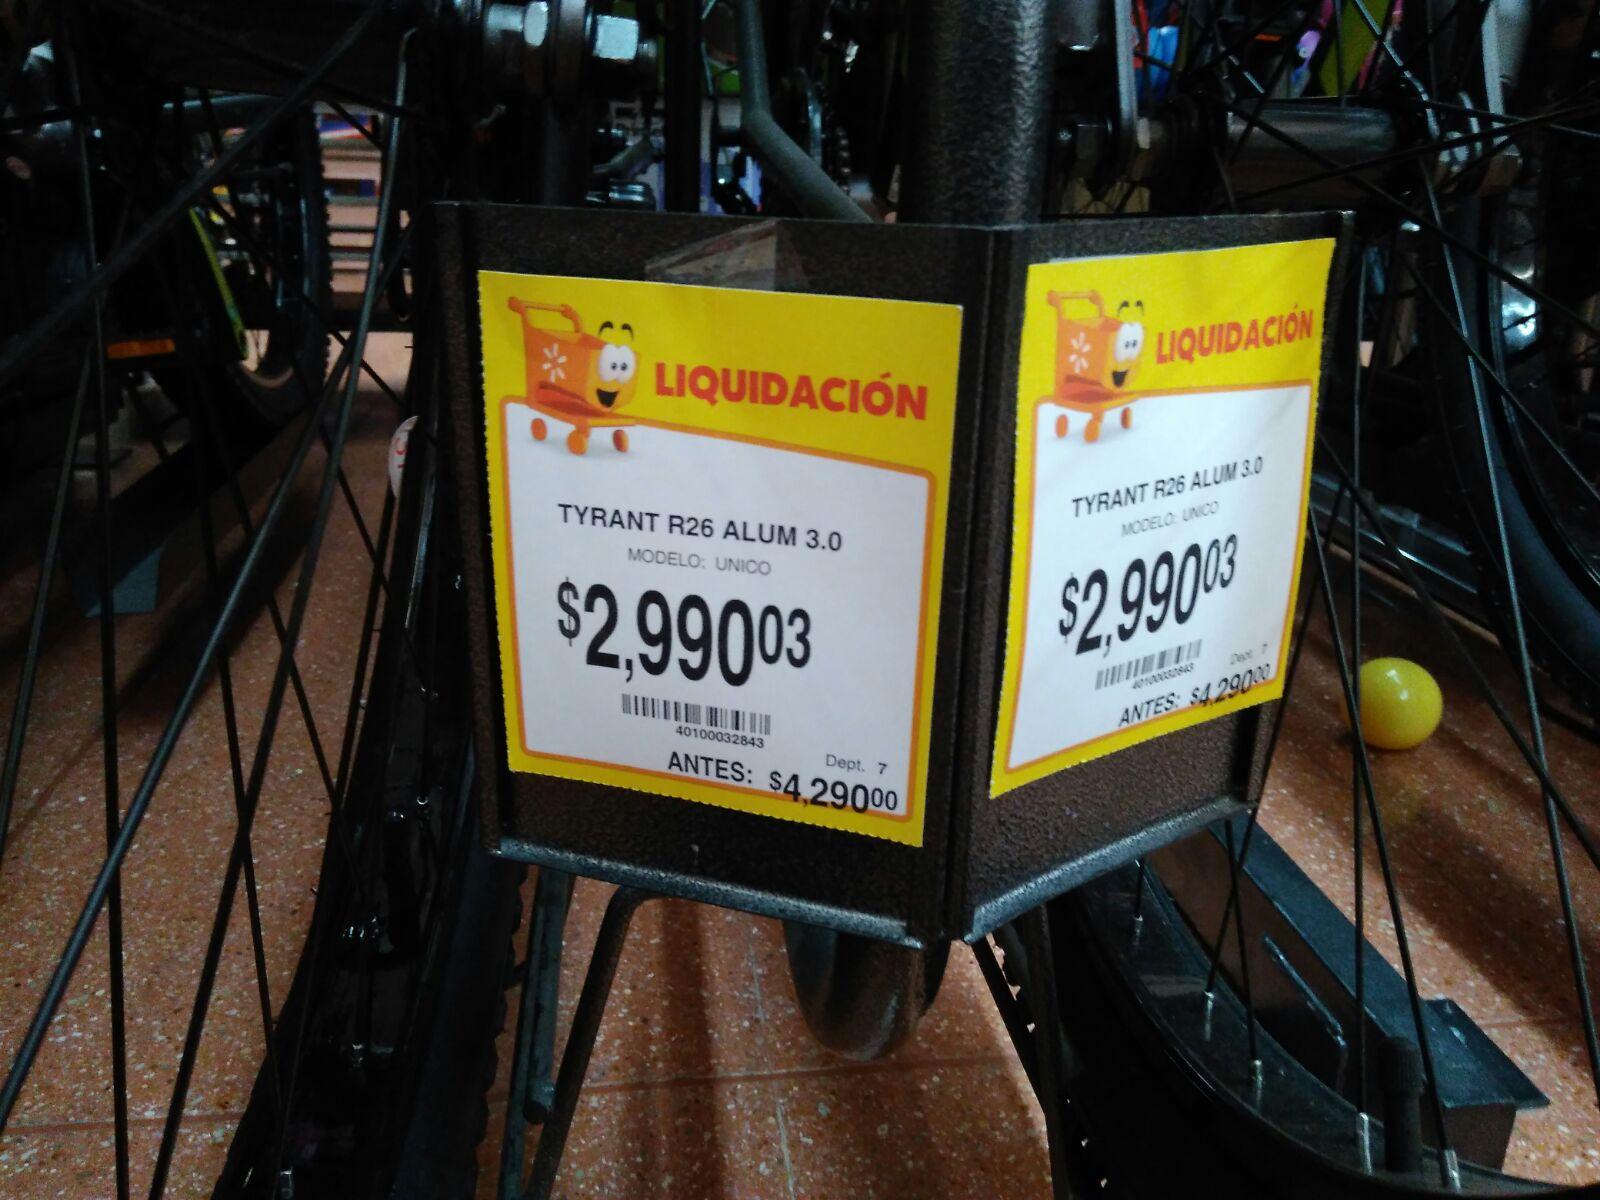 Walmart: Bicicleta Tyrant r26 Aluminio a $2,990.03